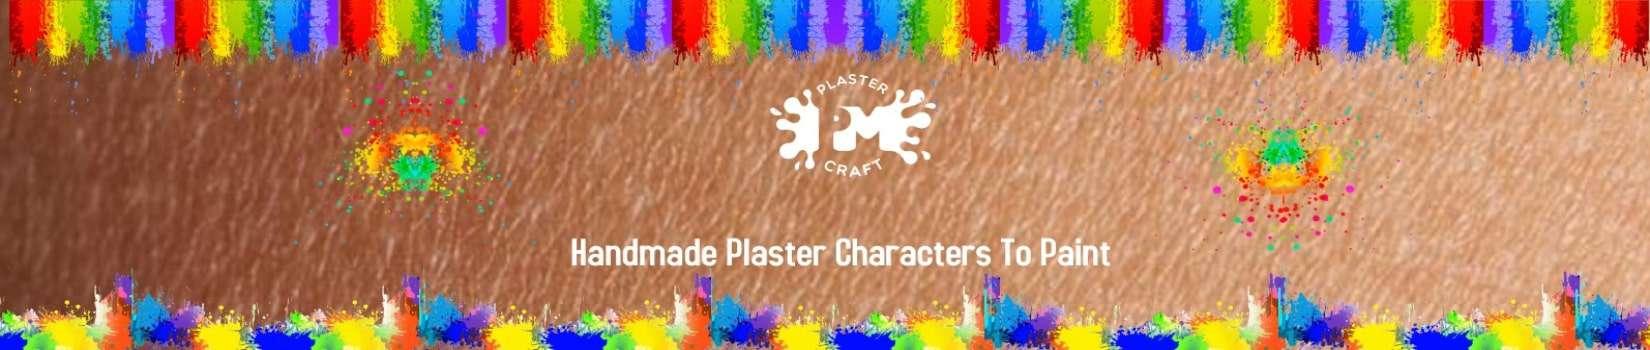 PM Plaster Craft